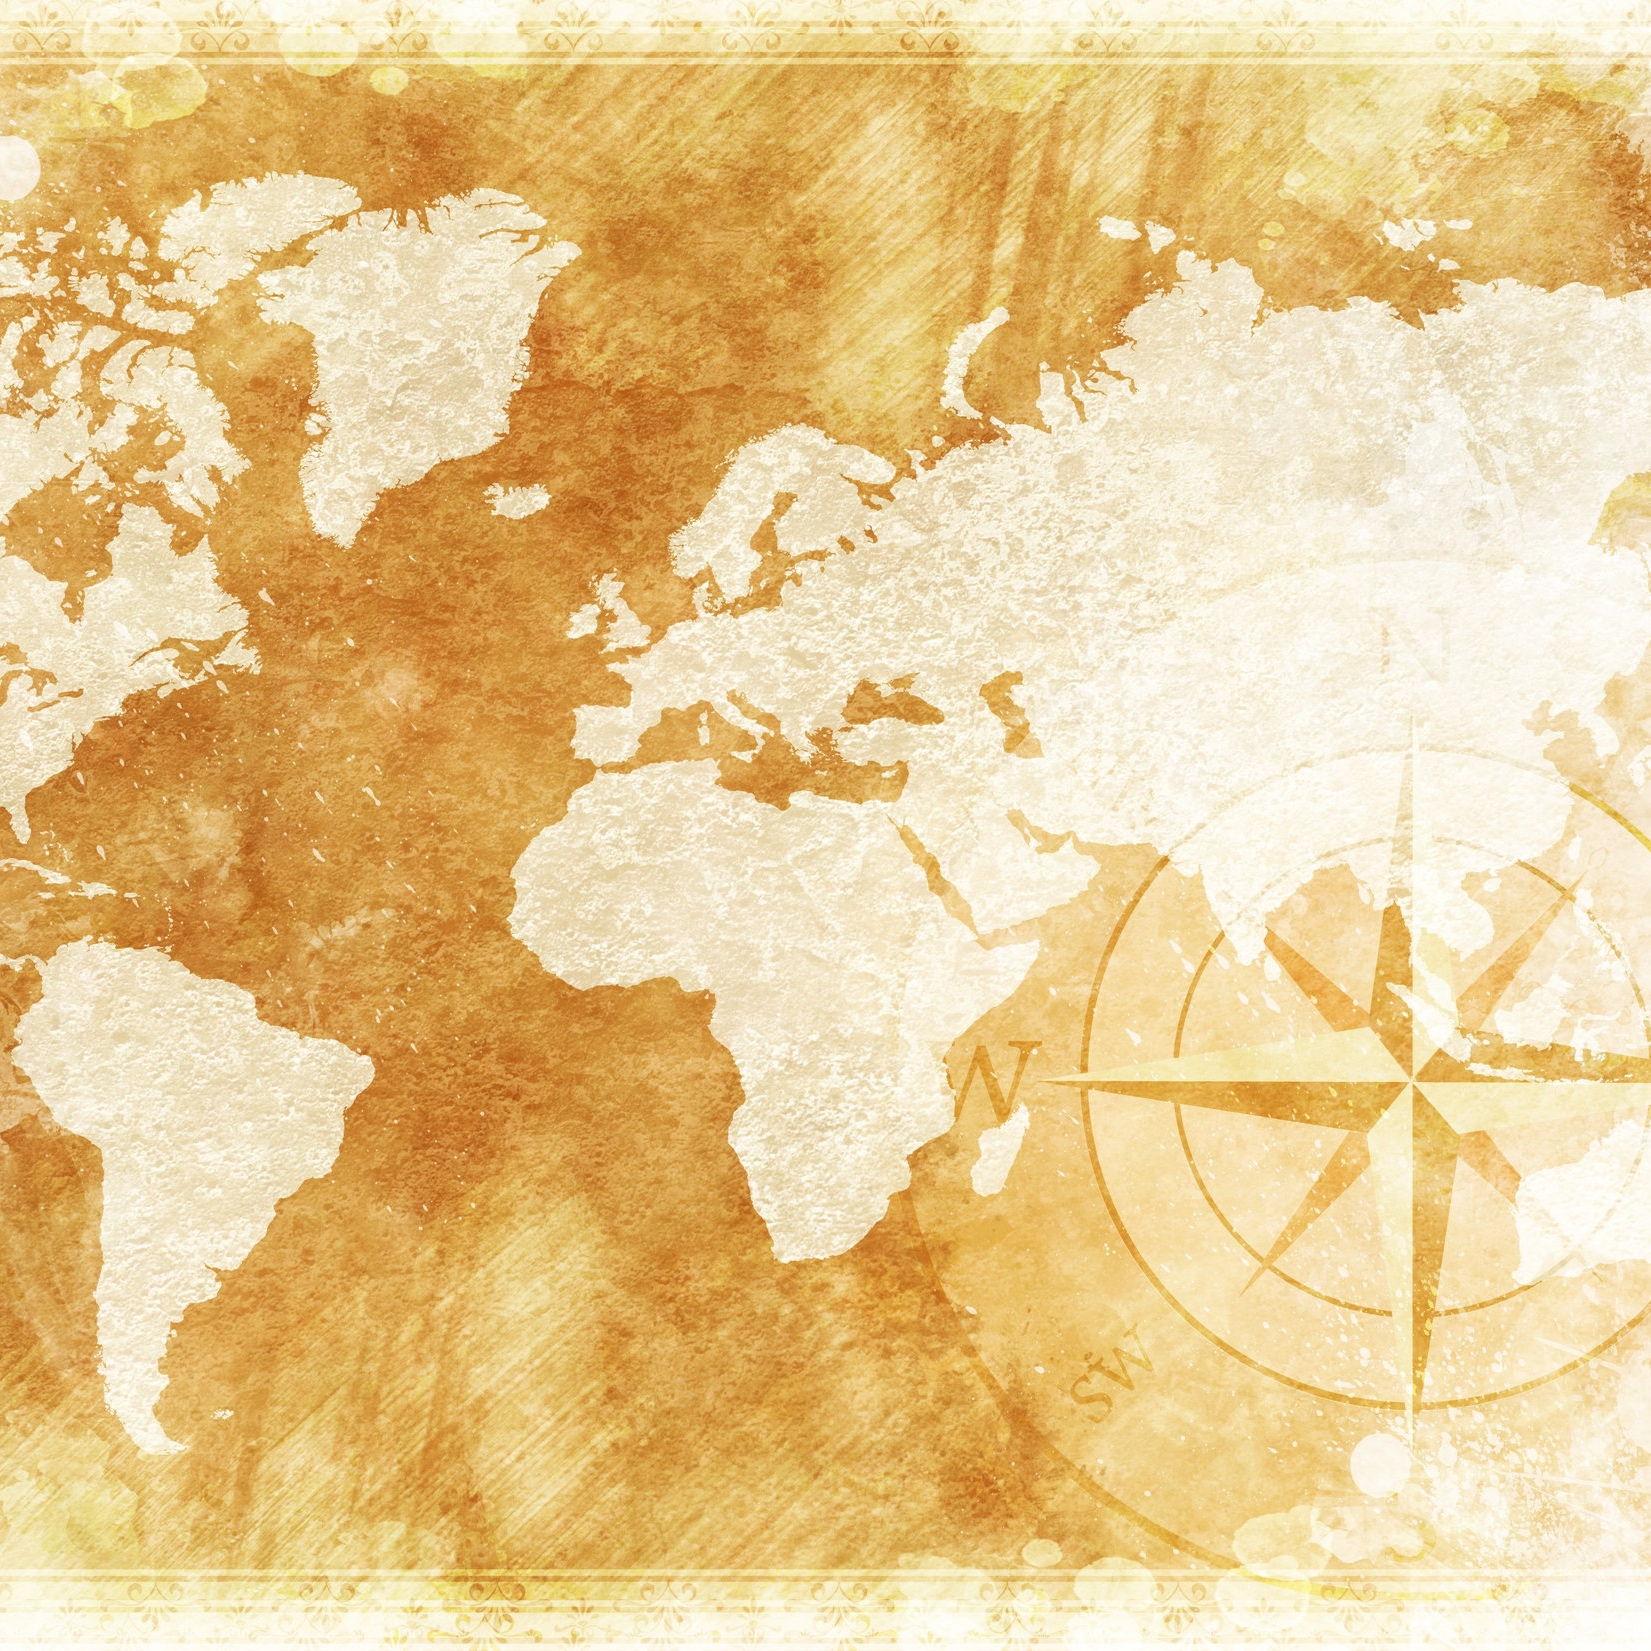 rustic-world-map_zkFp-Yrd.jpg